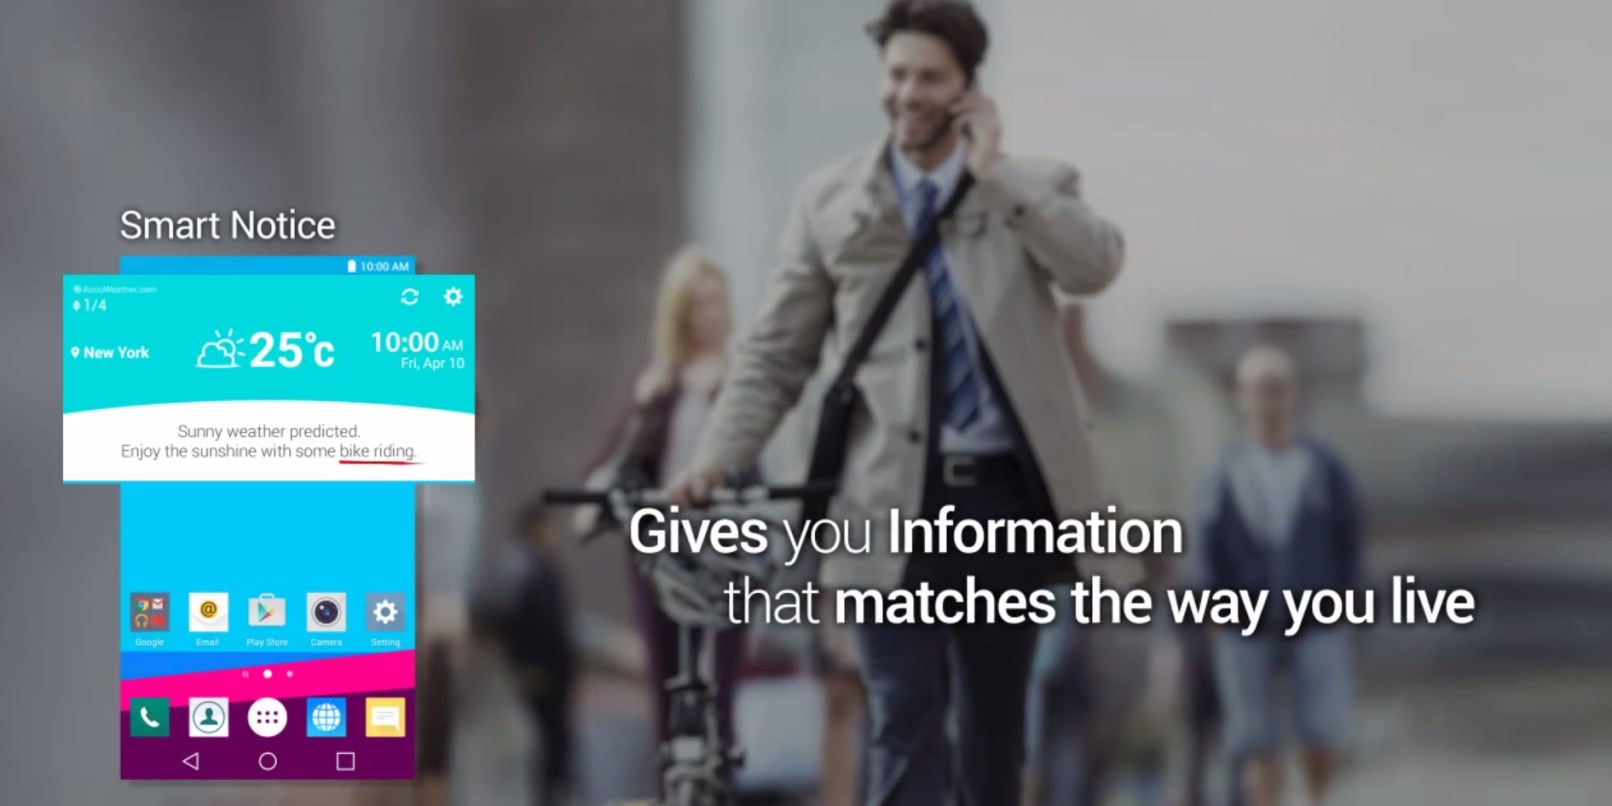 LG UX 4.0 Brings Manual Camera Mode, Intuitive Notifications